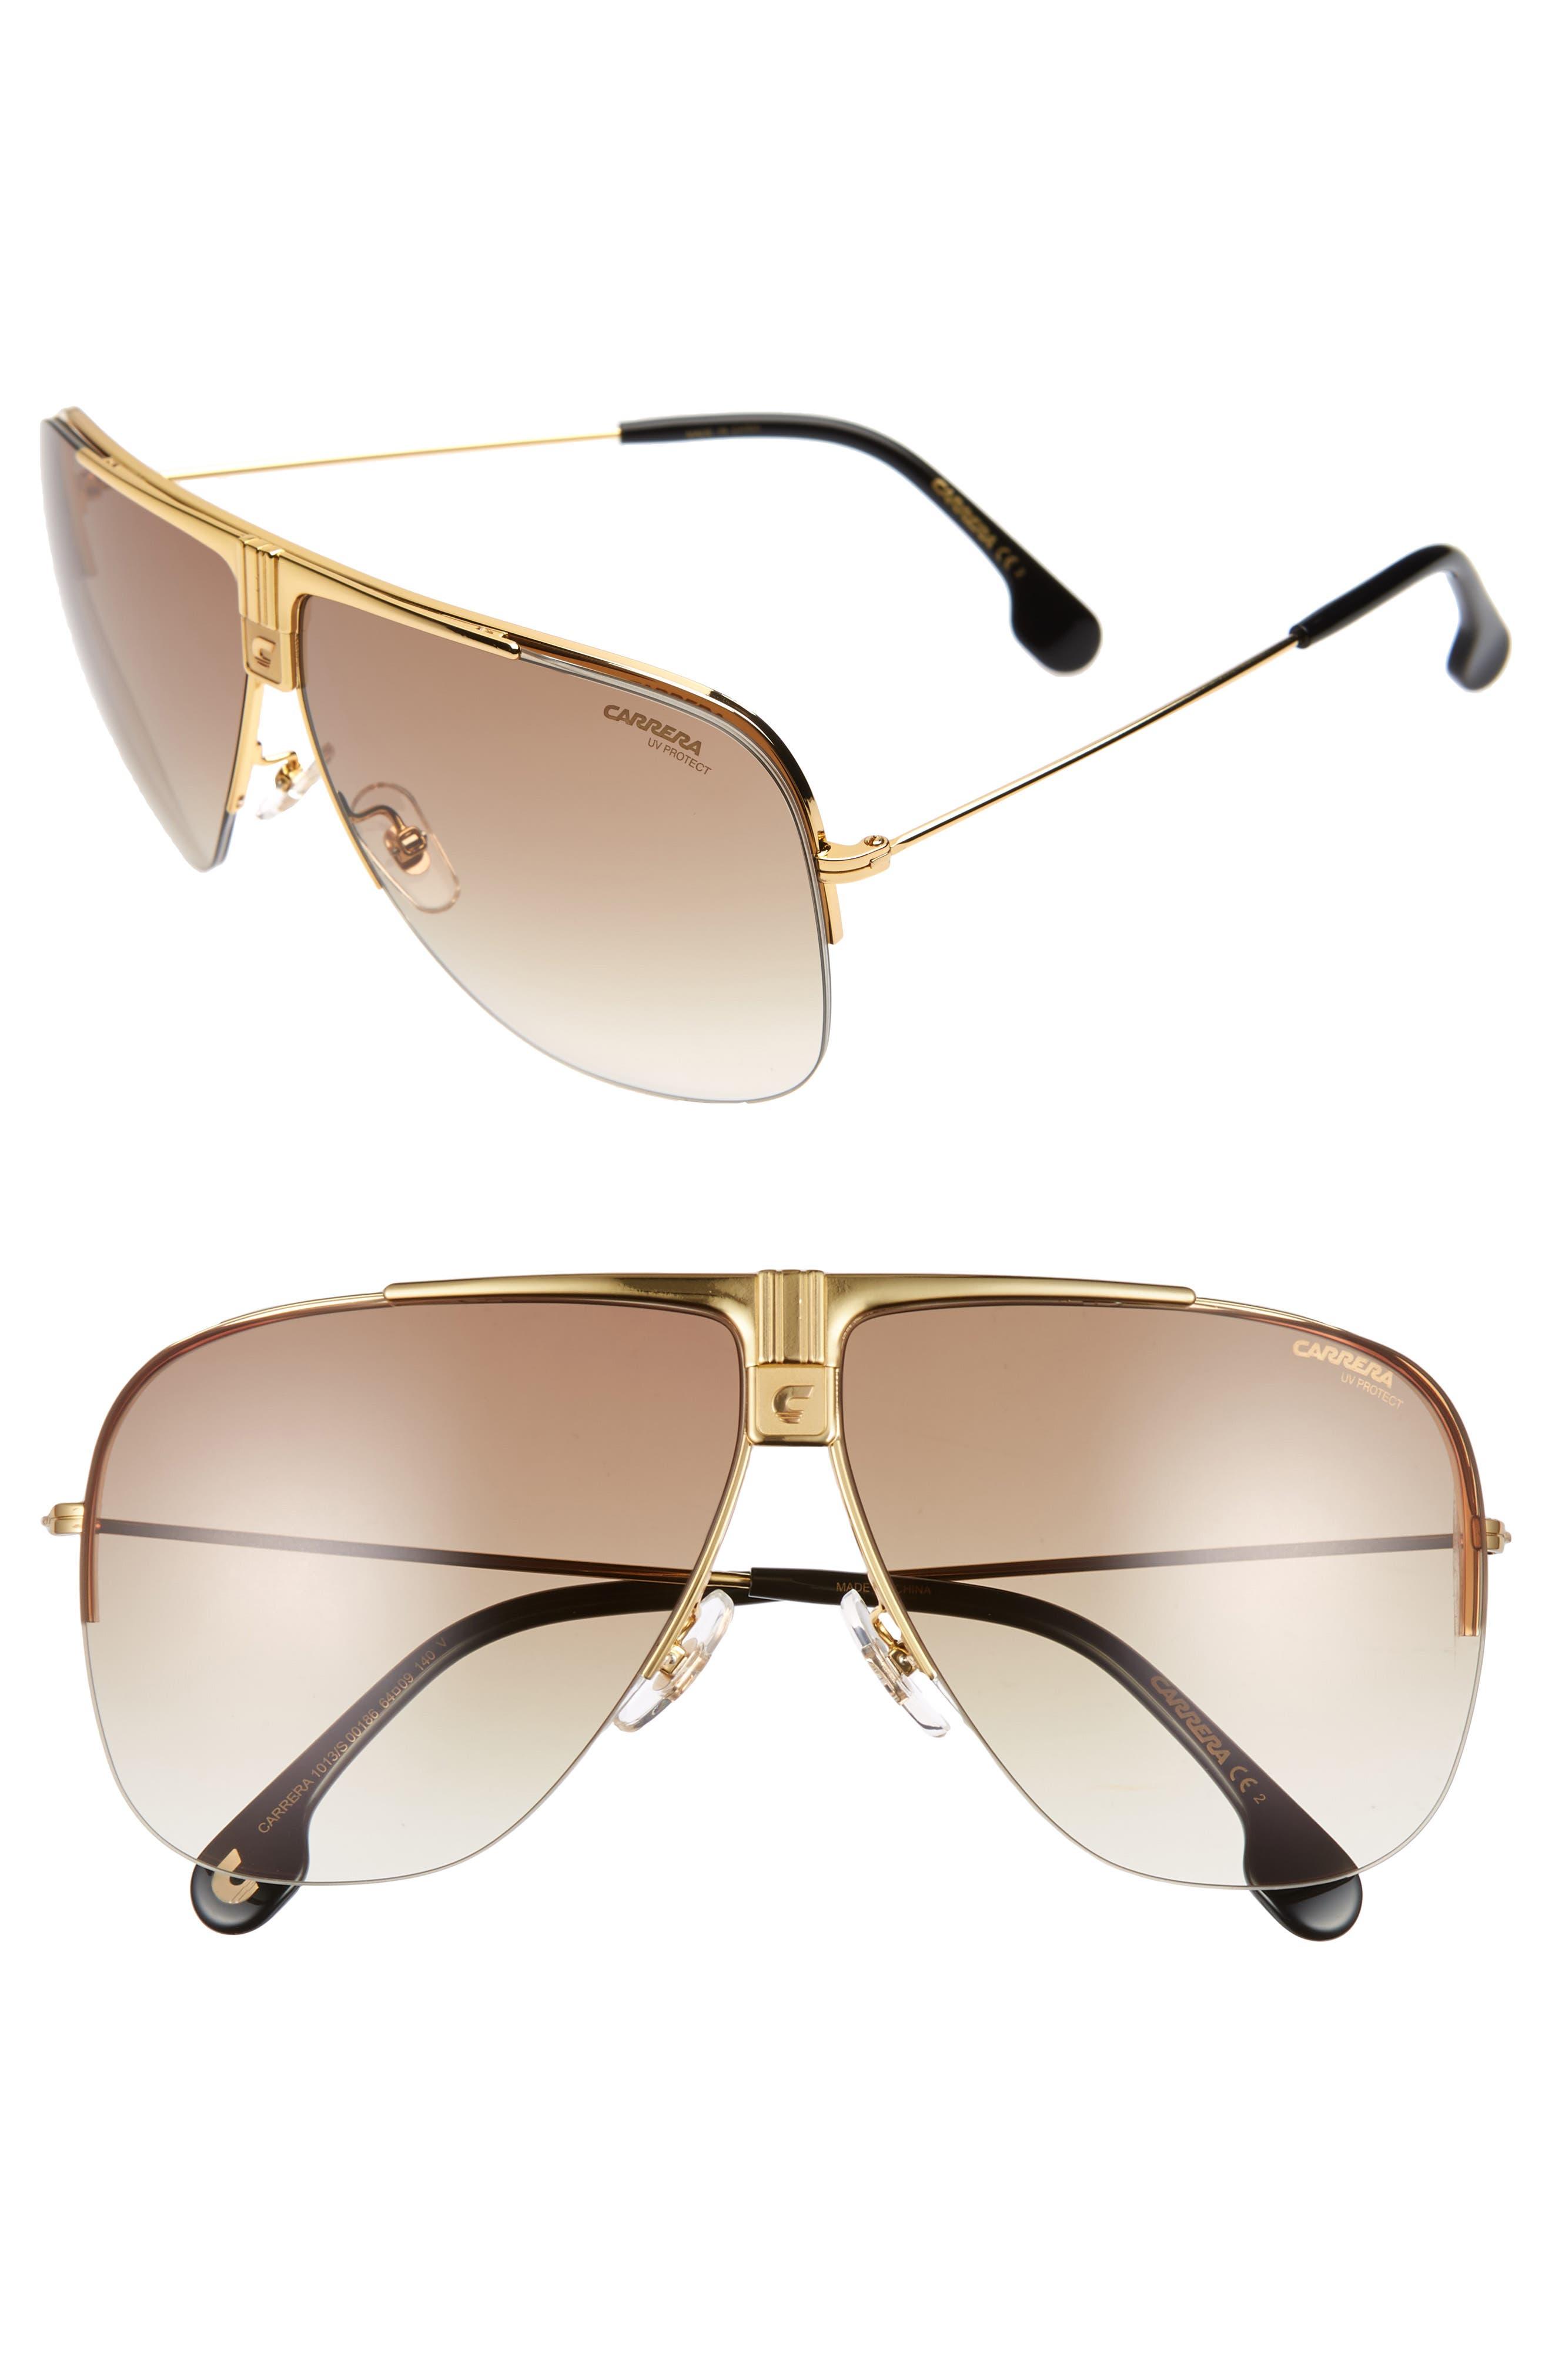 Carrera Eyewear Metal Aviator Sunglasses - Yellow Gold